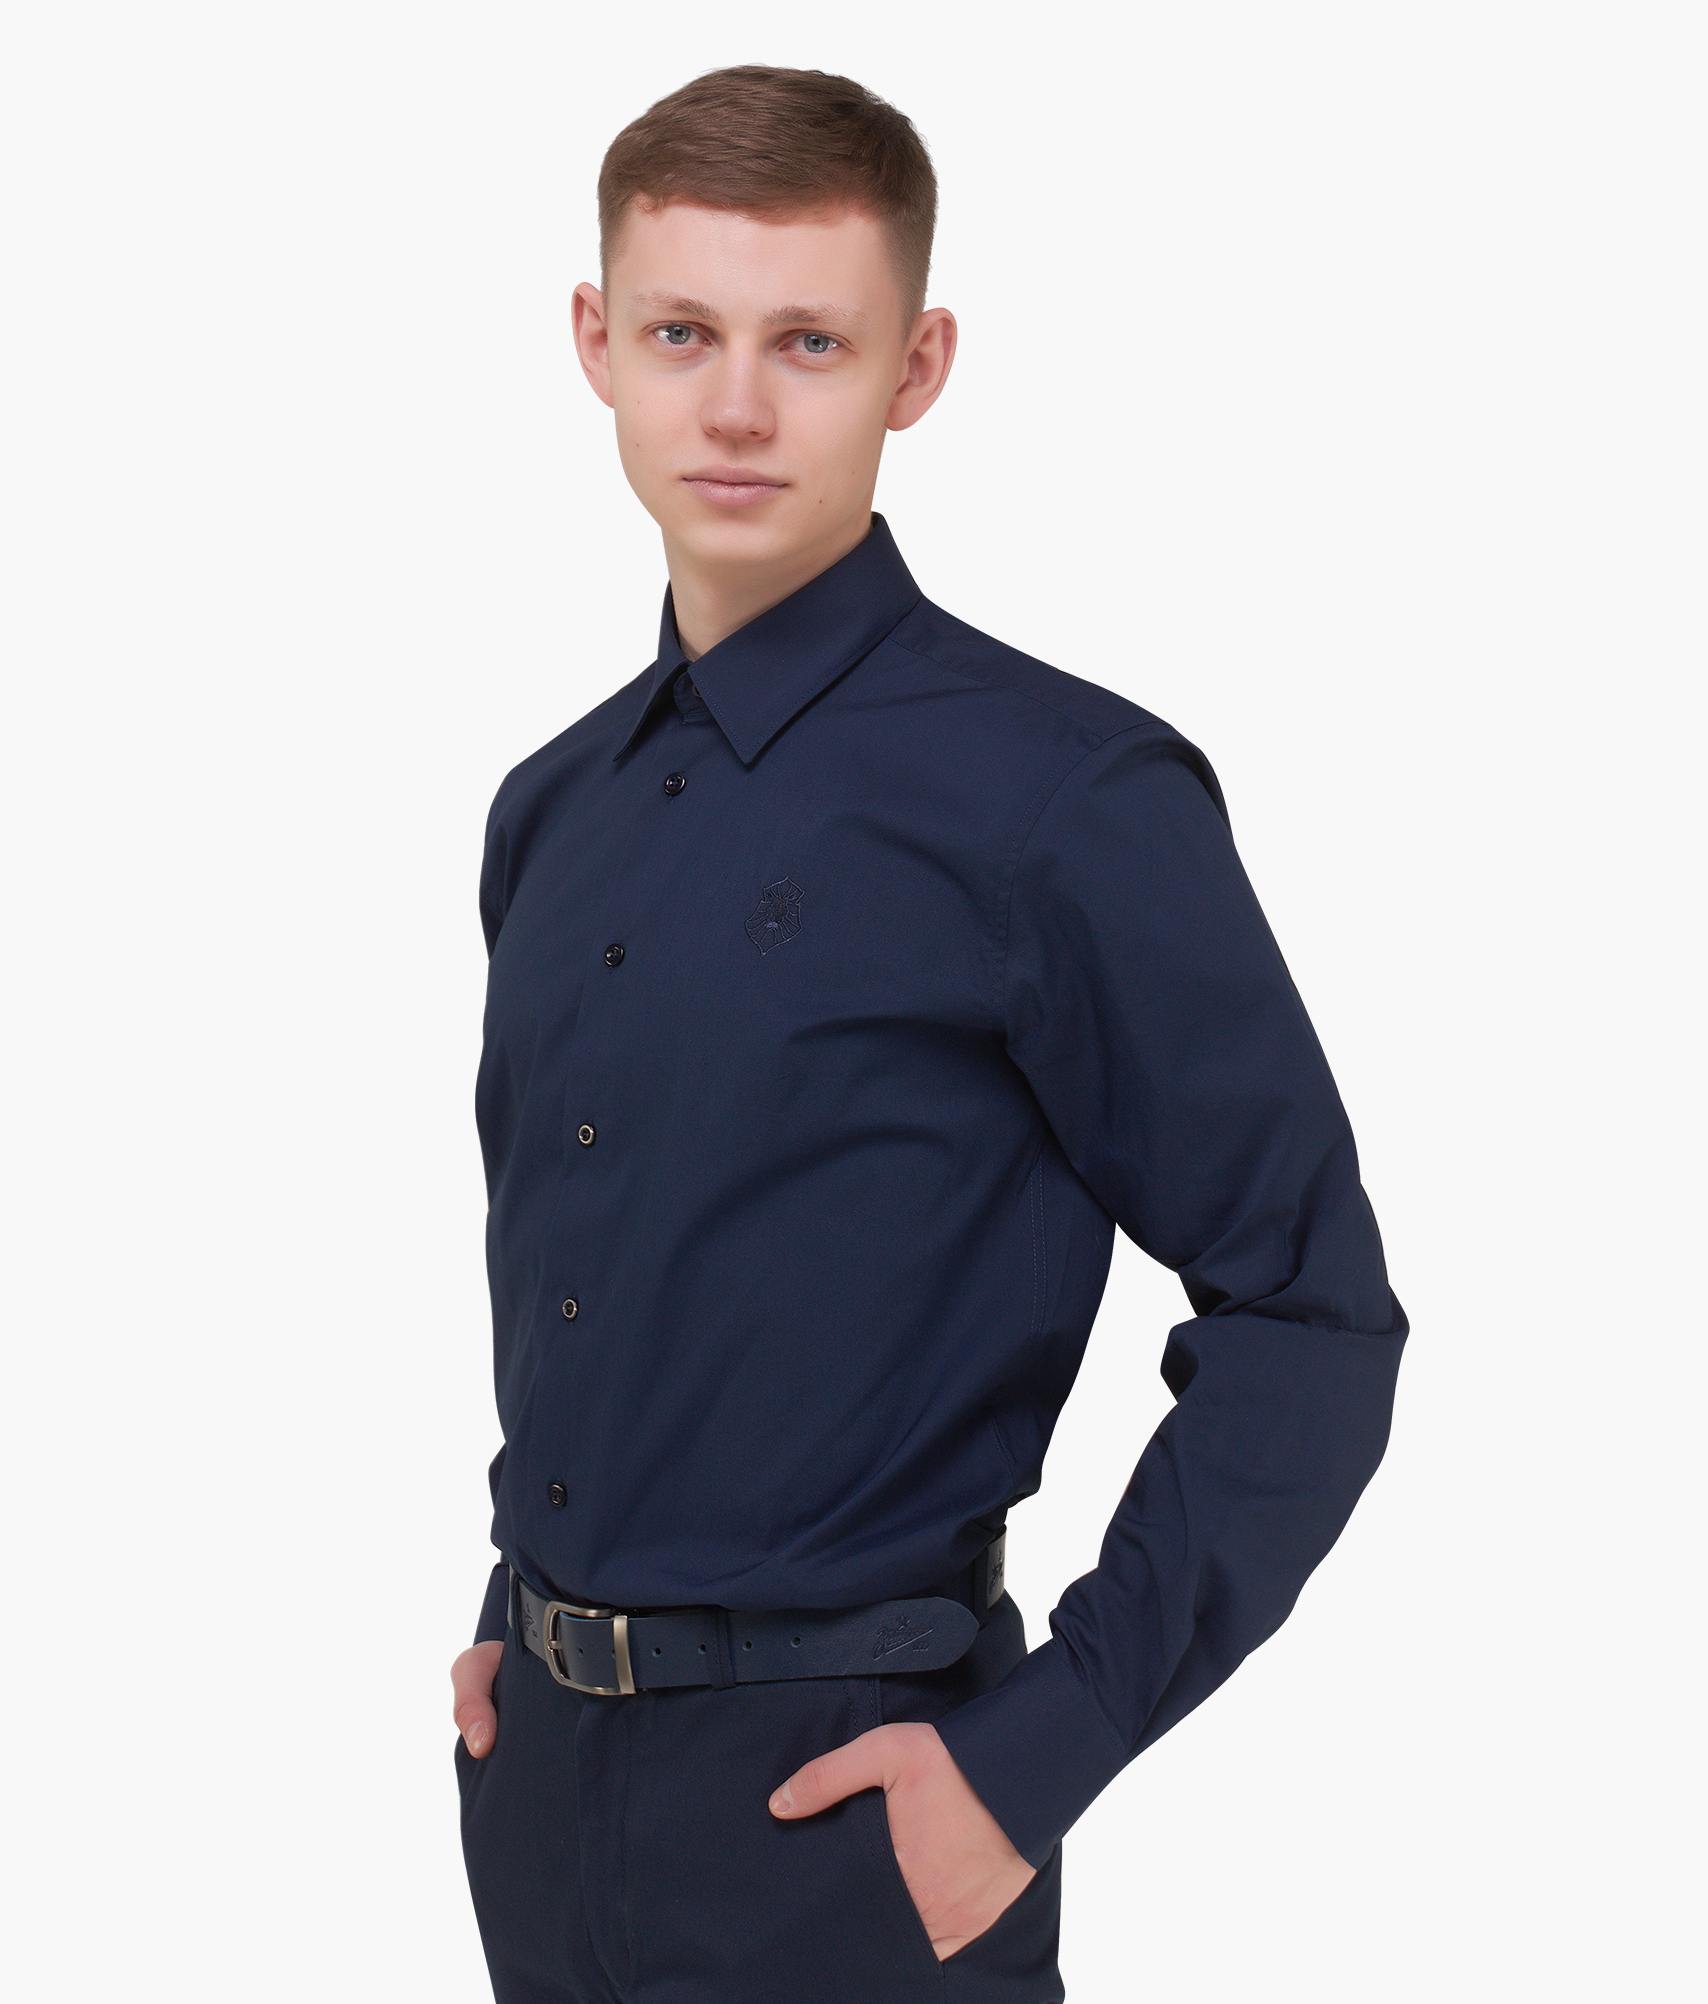 Рубашка мужская Зенит Цвет-Темно-Синий рубашка armani exchange 8nzc61 z8apz 0501